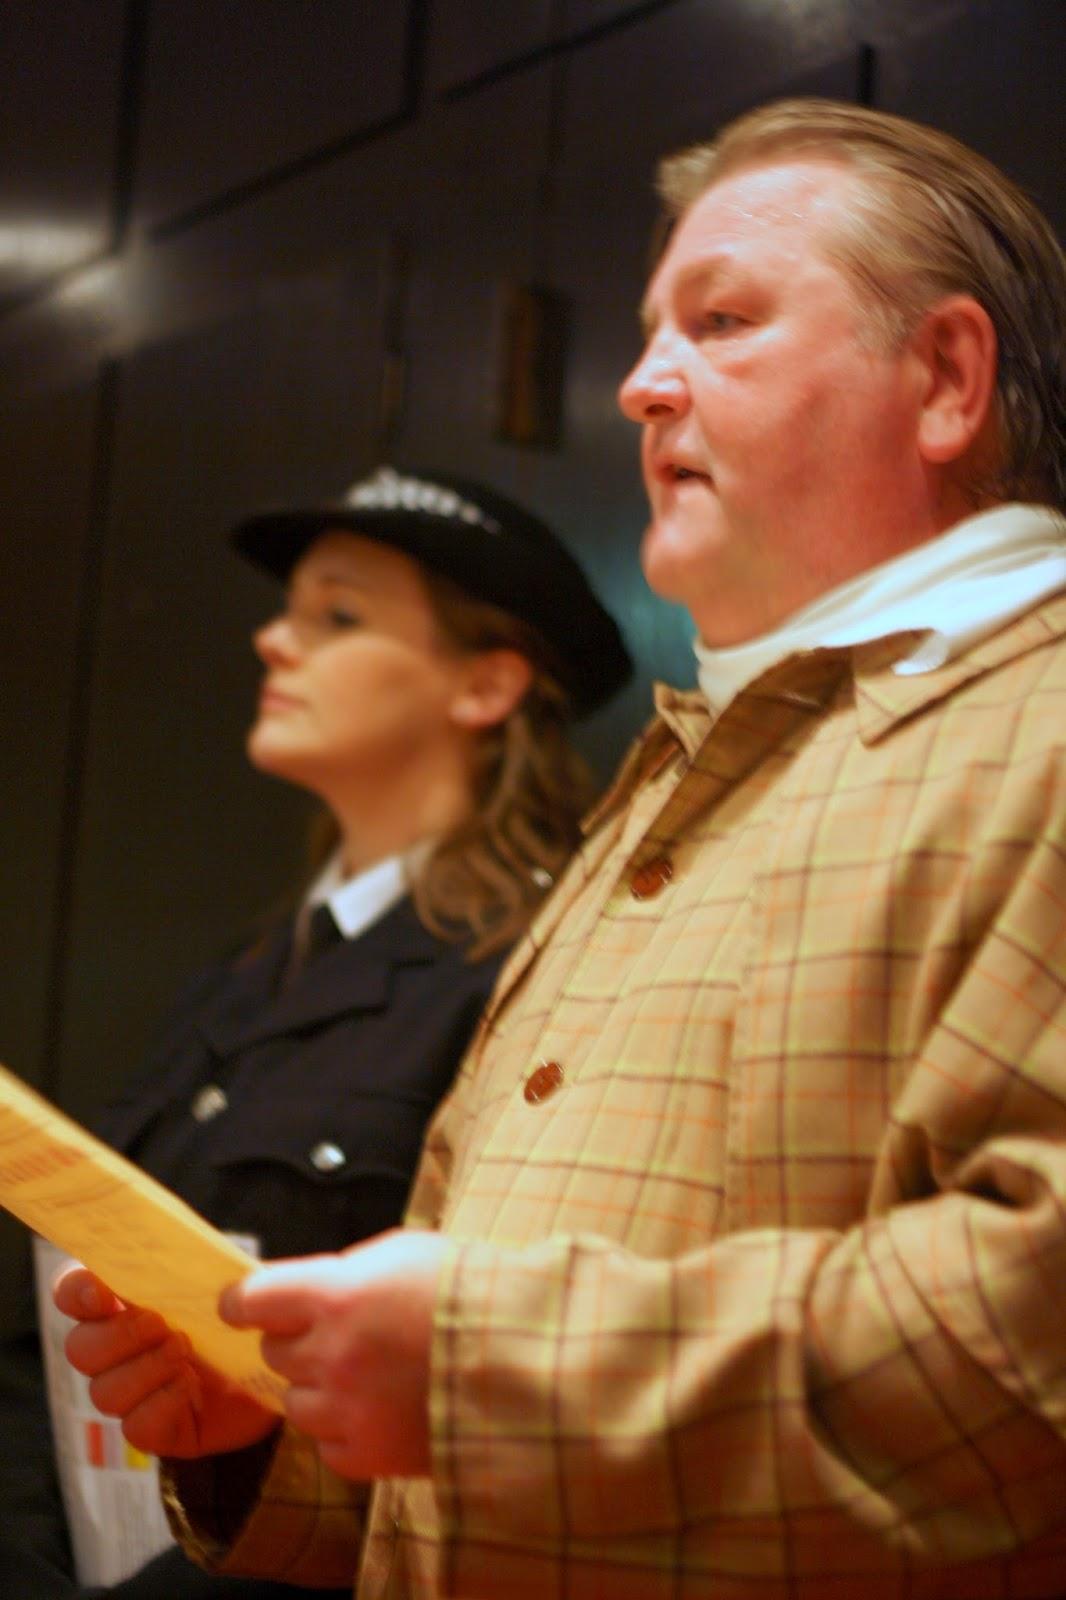 BGO's Sherlock Holmes & PC World explain the name of the game | Anyonita-Nibbles.co.uk